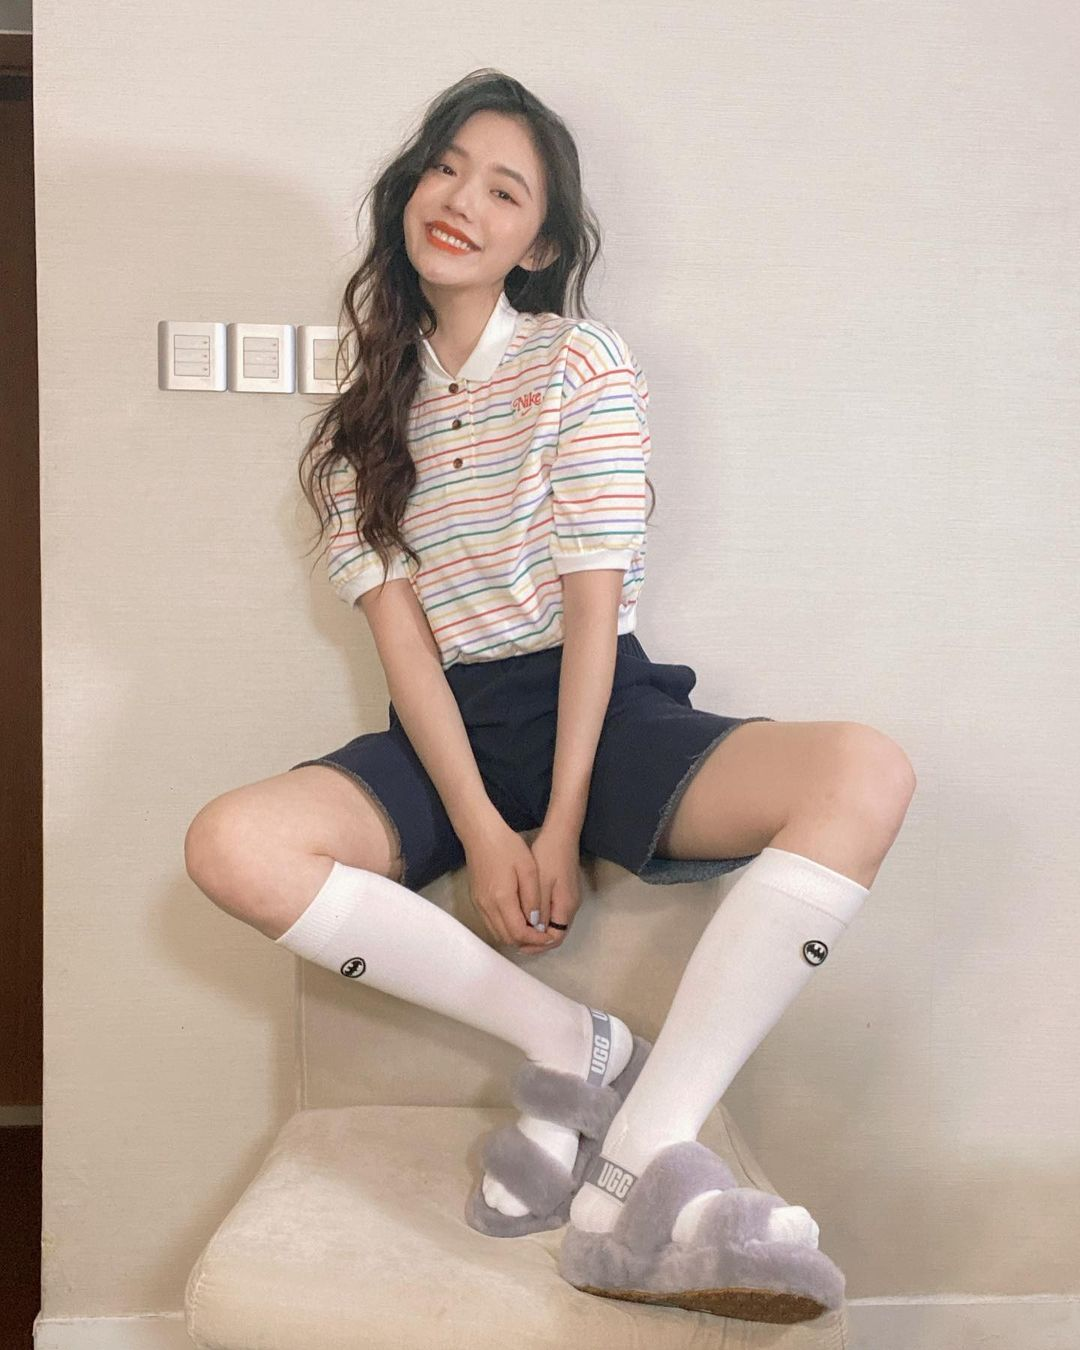 Fakta Lin Yun, Aktris Cantik yang Bantu Stephen Chow dari Kebangkrutan